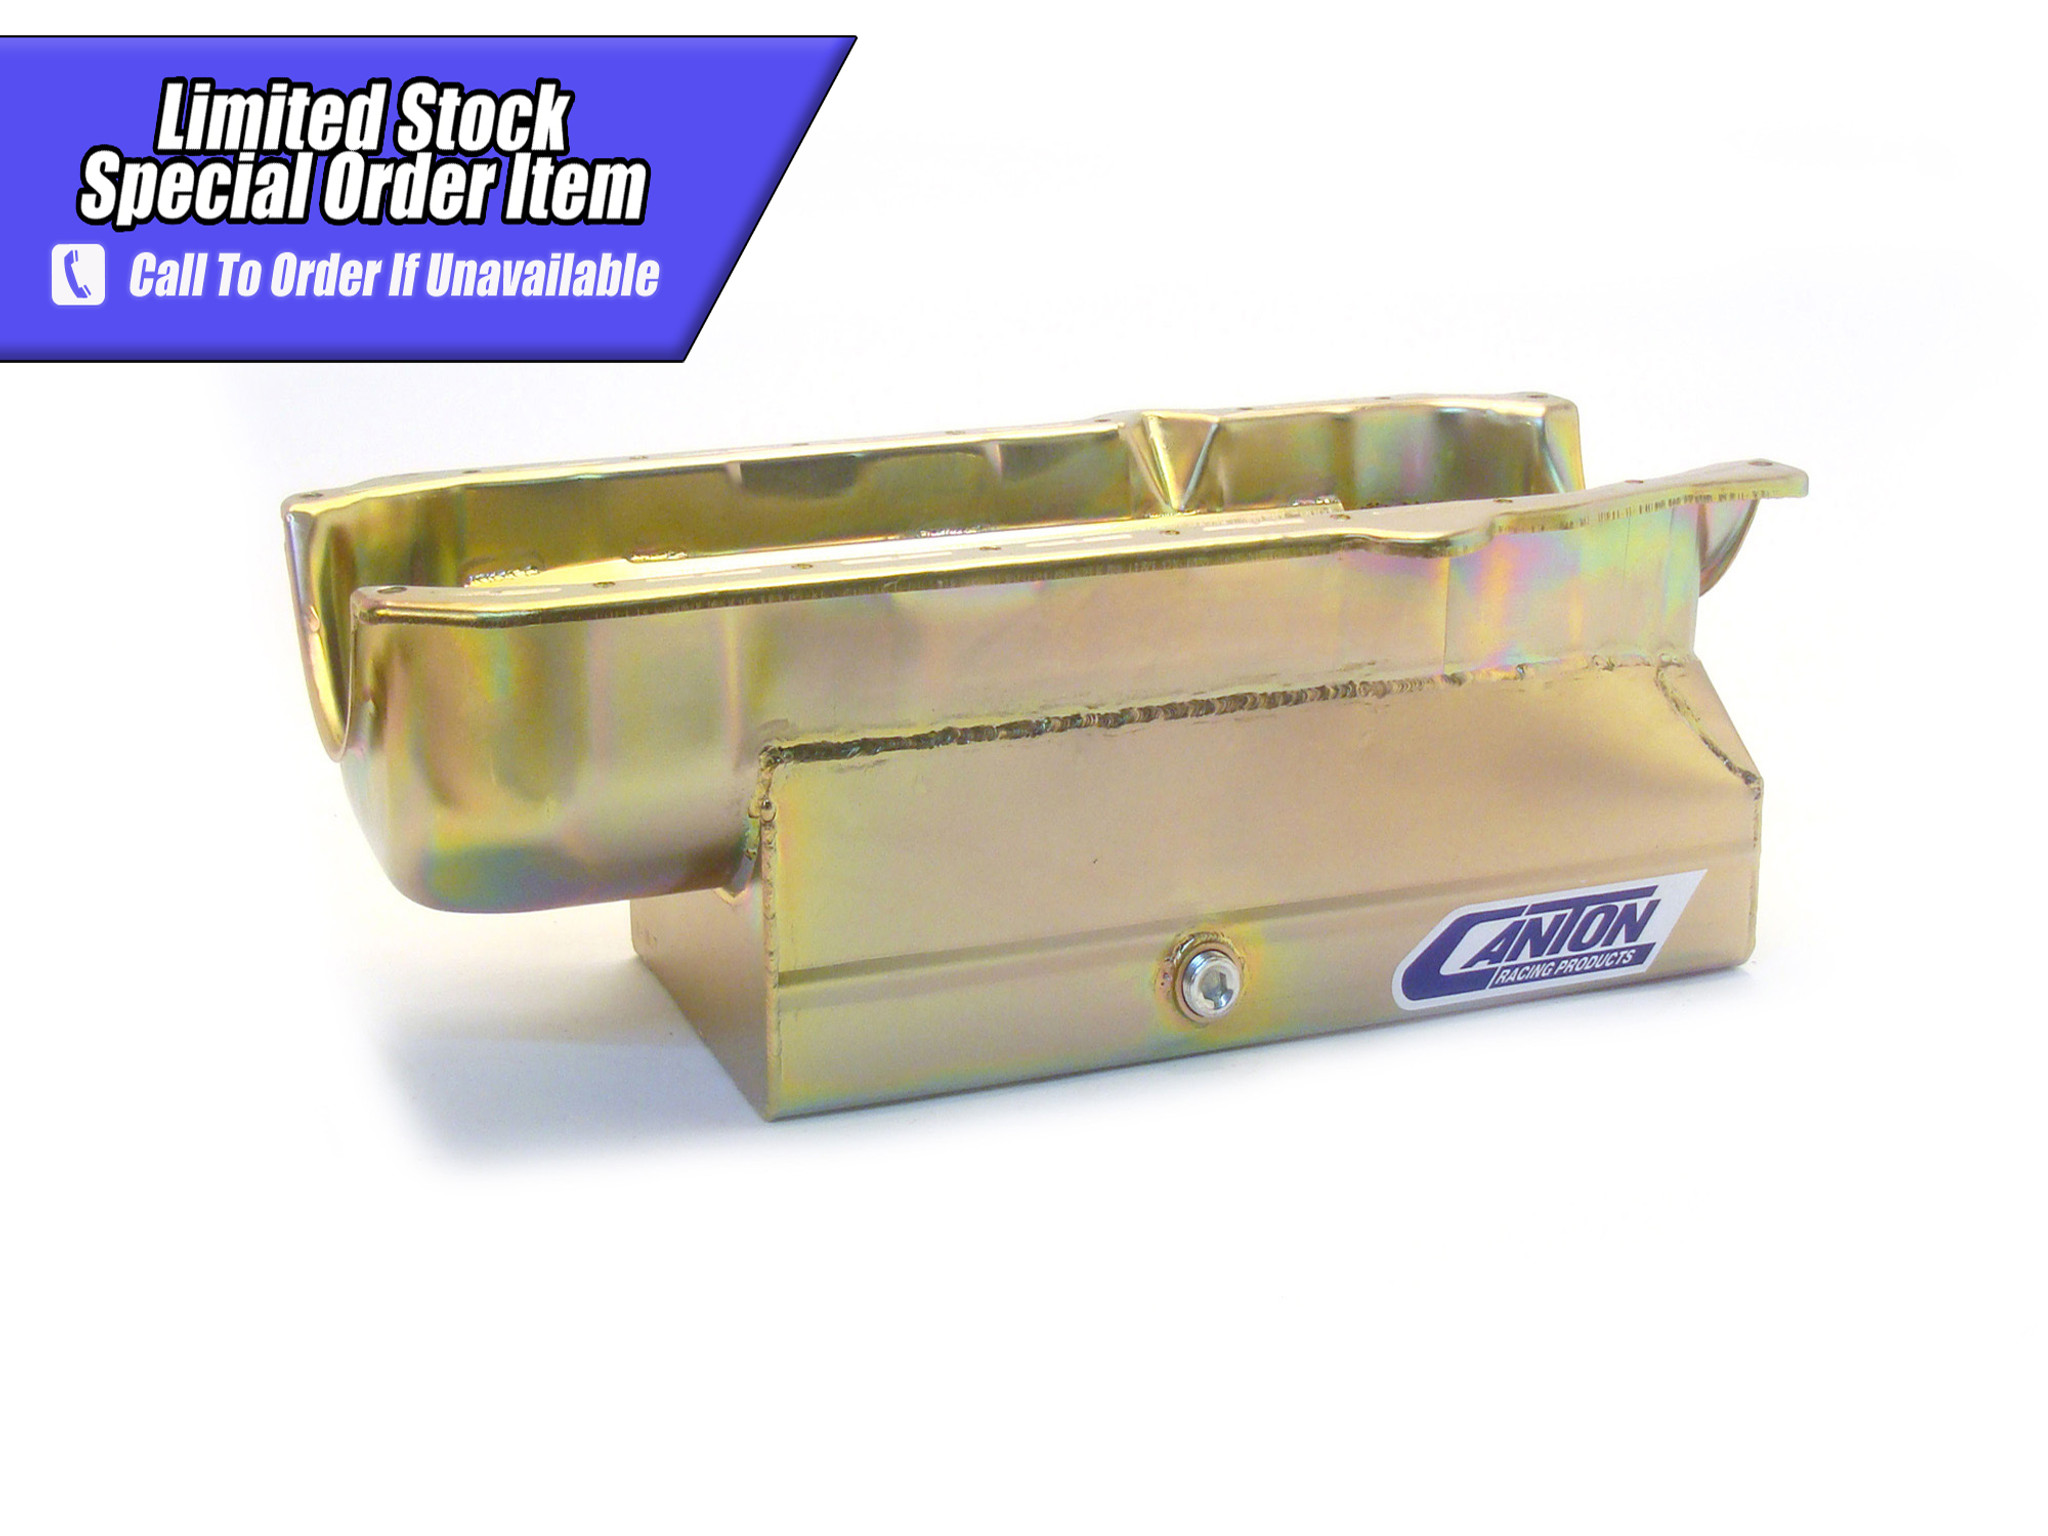 Canton 20-040 Oil Pan Pickup for Oil Pan 11-180 SB Chevy